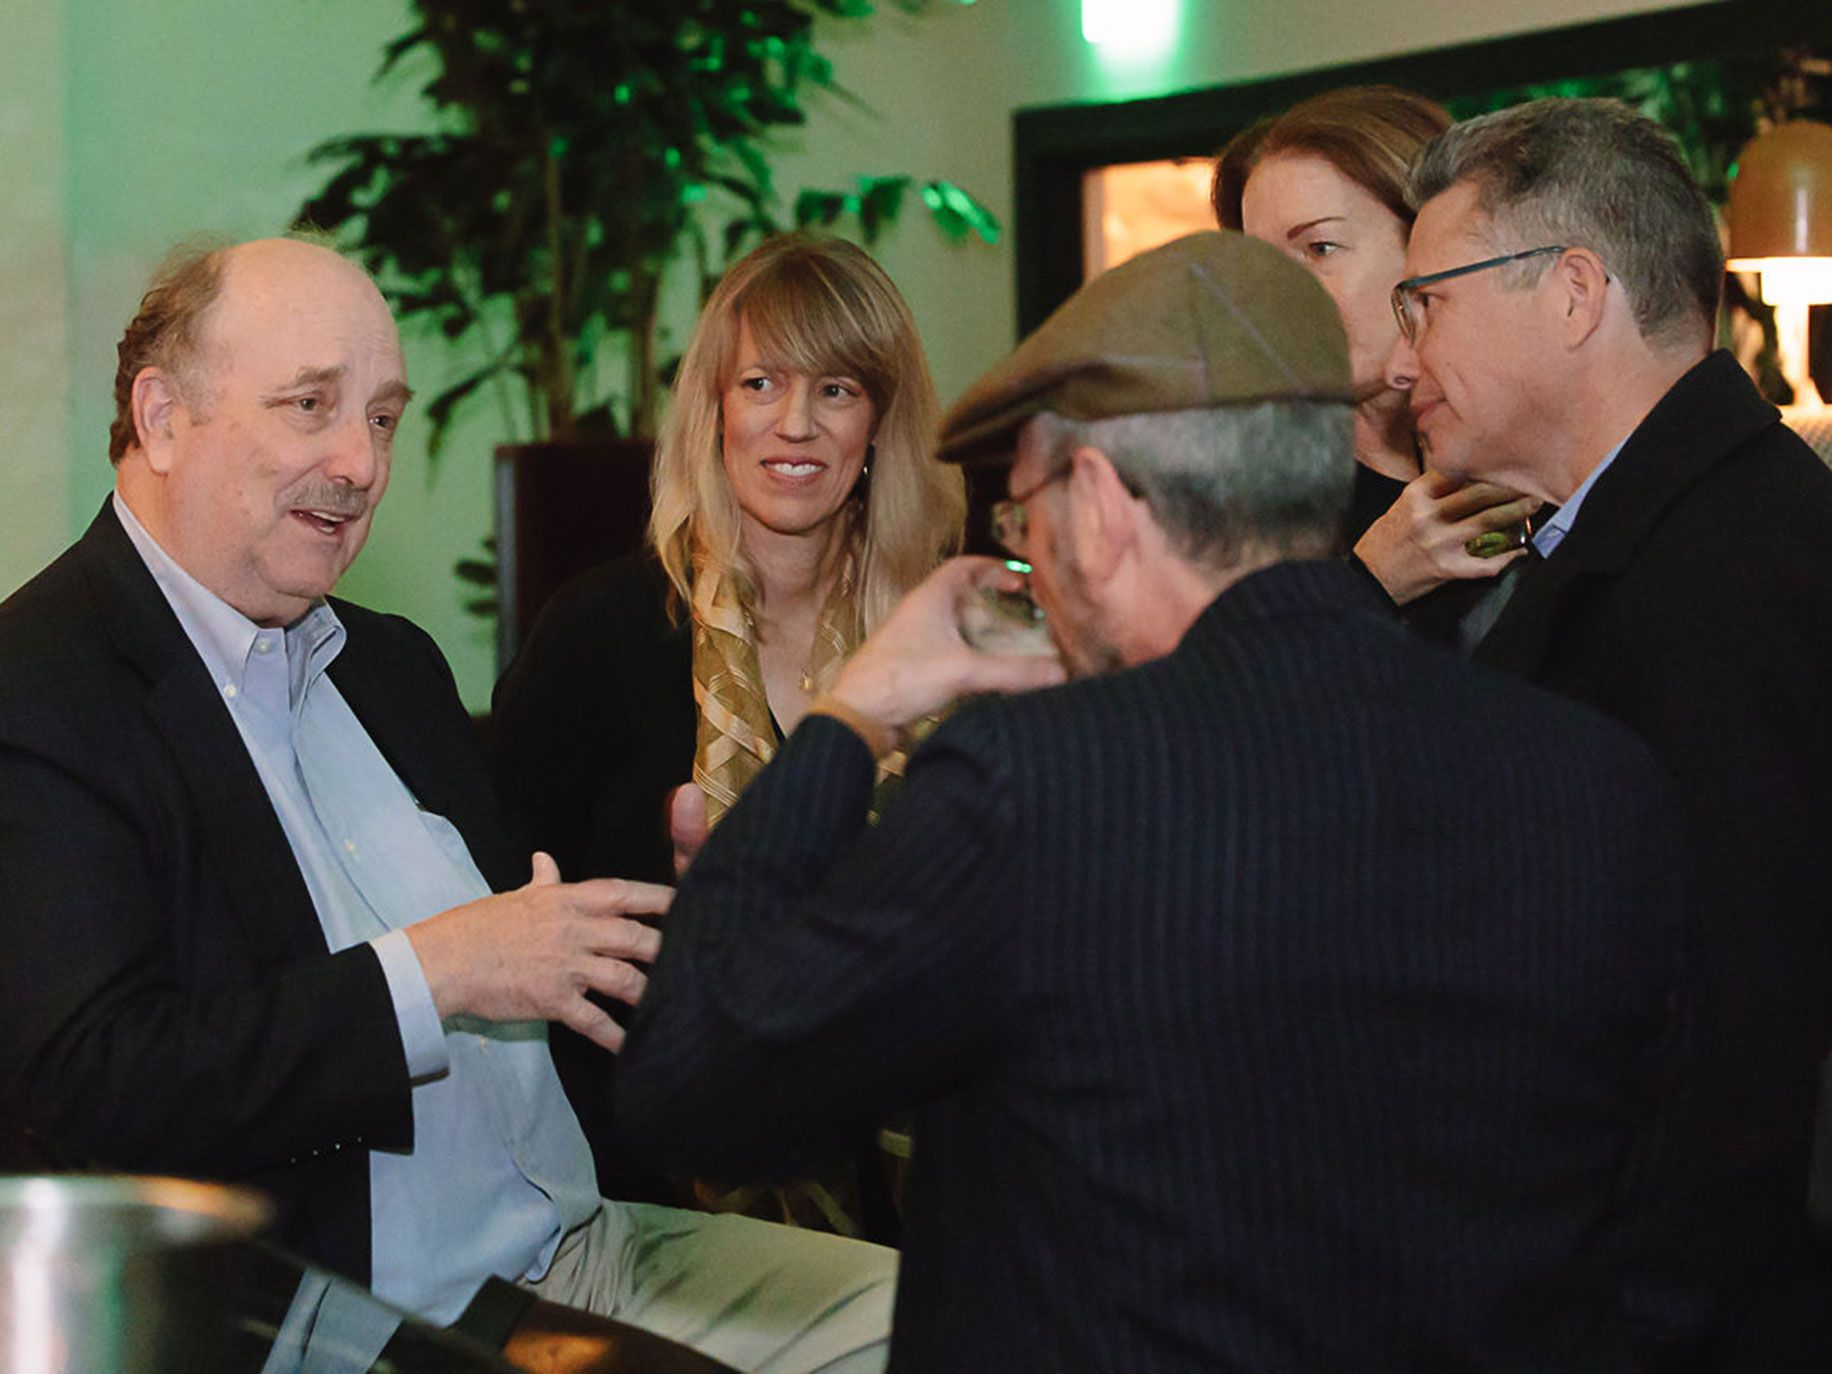 <em>Alta</em> publisher Will Hearst, <em>Alta</em> Editor-at-Large Mary Melton, Amy Wallace, Jesse Katz, and Ed Leibowitz gather around the bar at Checker Hall.